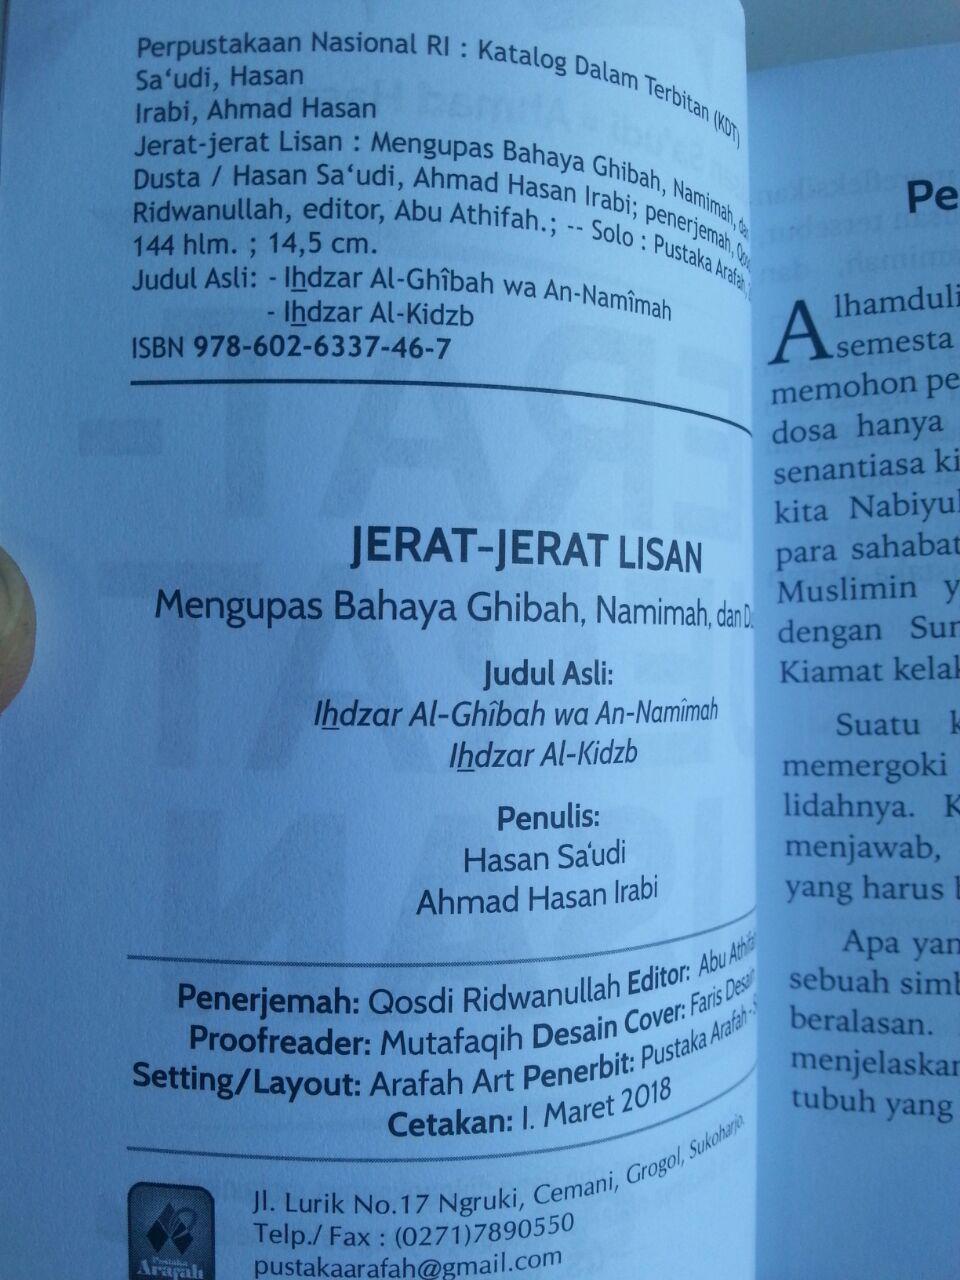 Buku Jerat-Jerat Lisan Lisan Mengupas Bahaya Ghibah Namimah isi 2